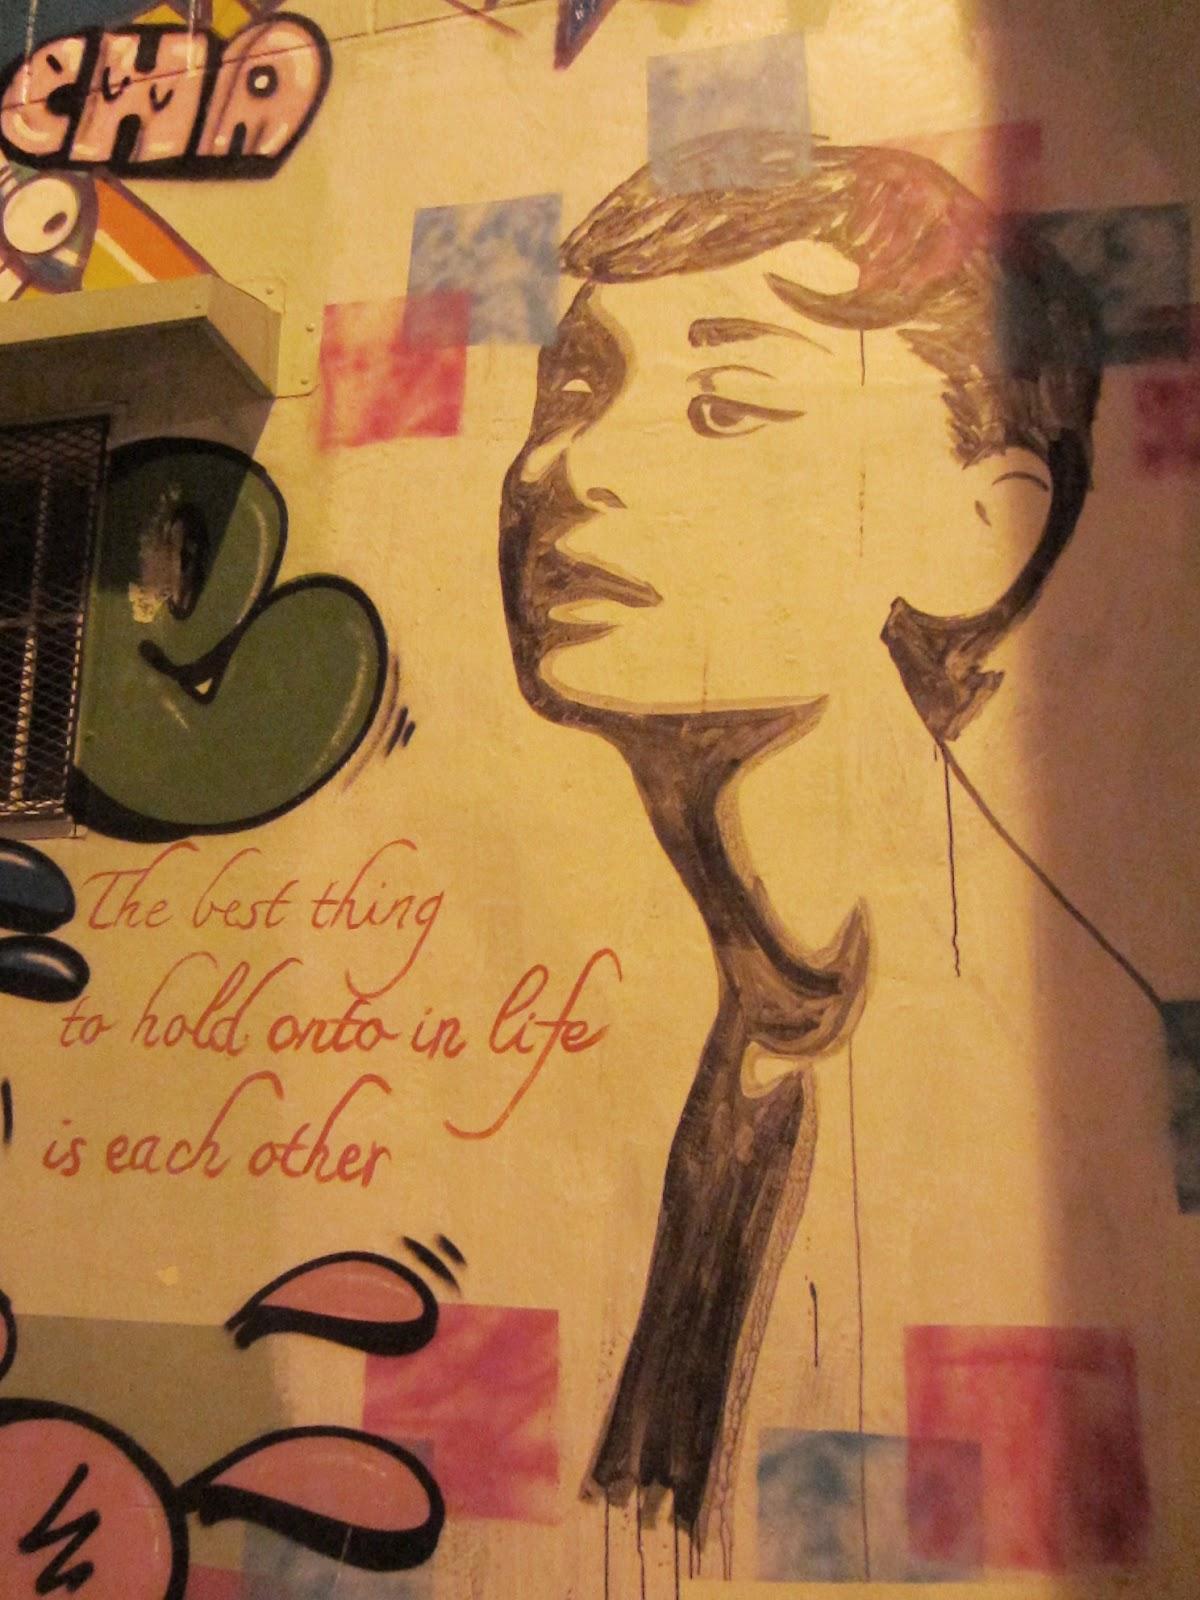 Wynwood Walls: Miami Art Walk | PrettytheFool